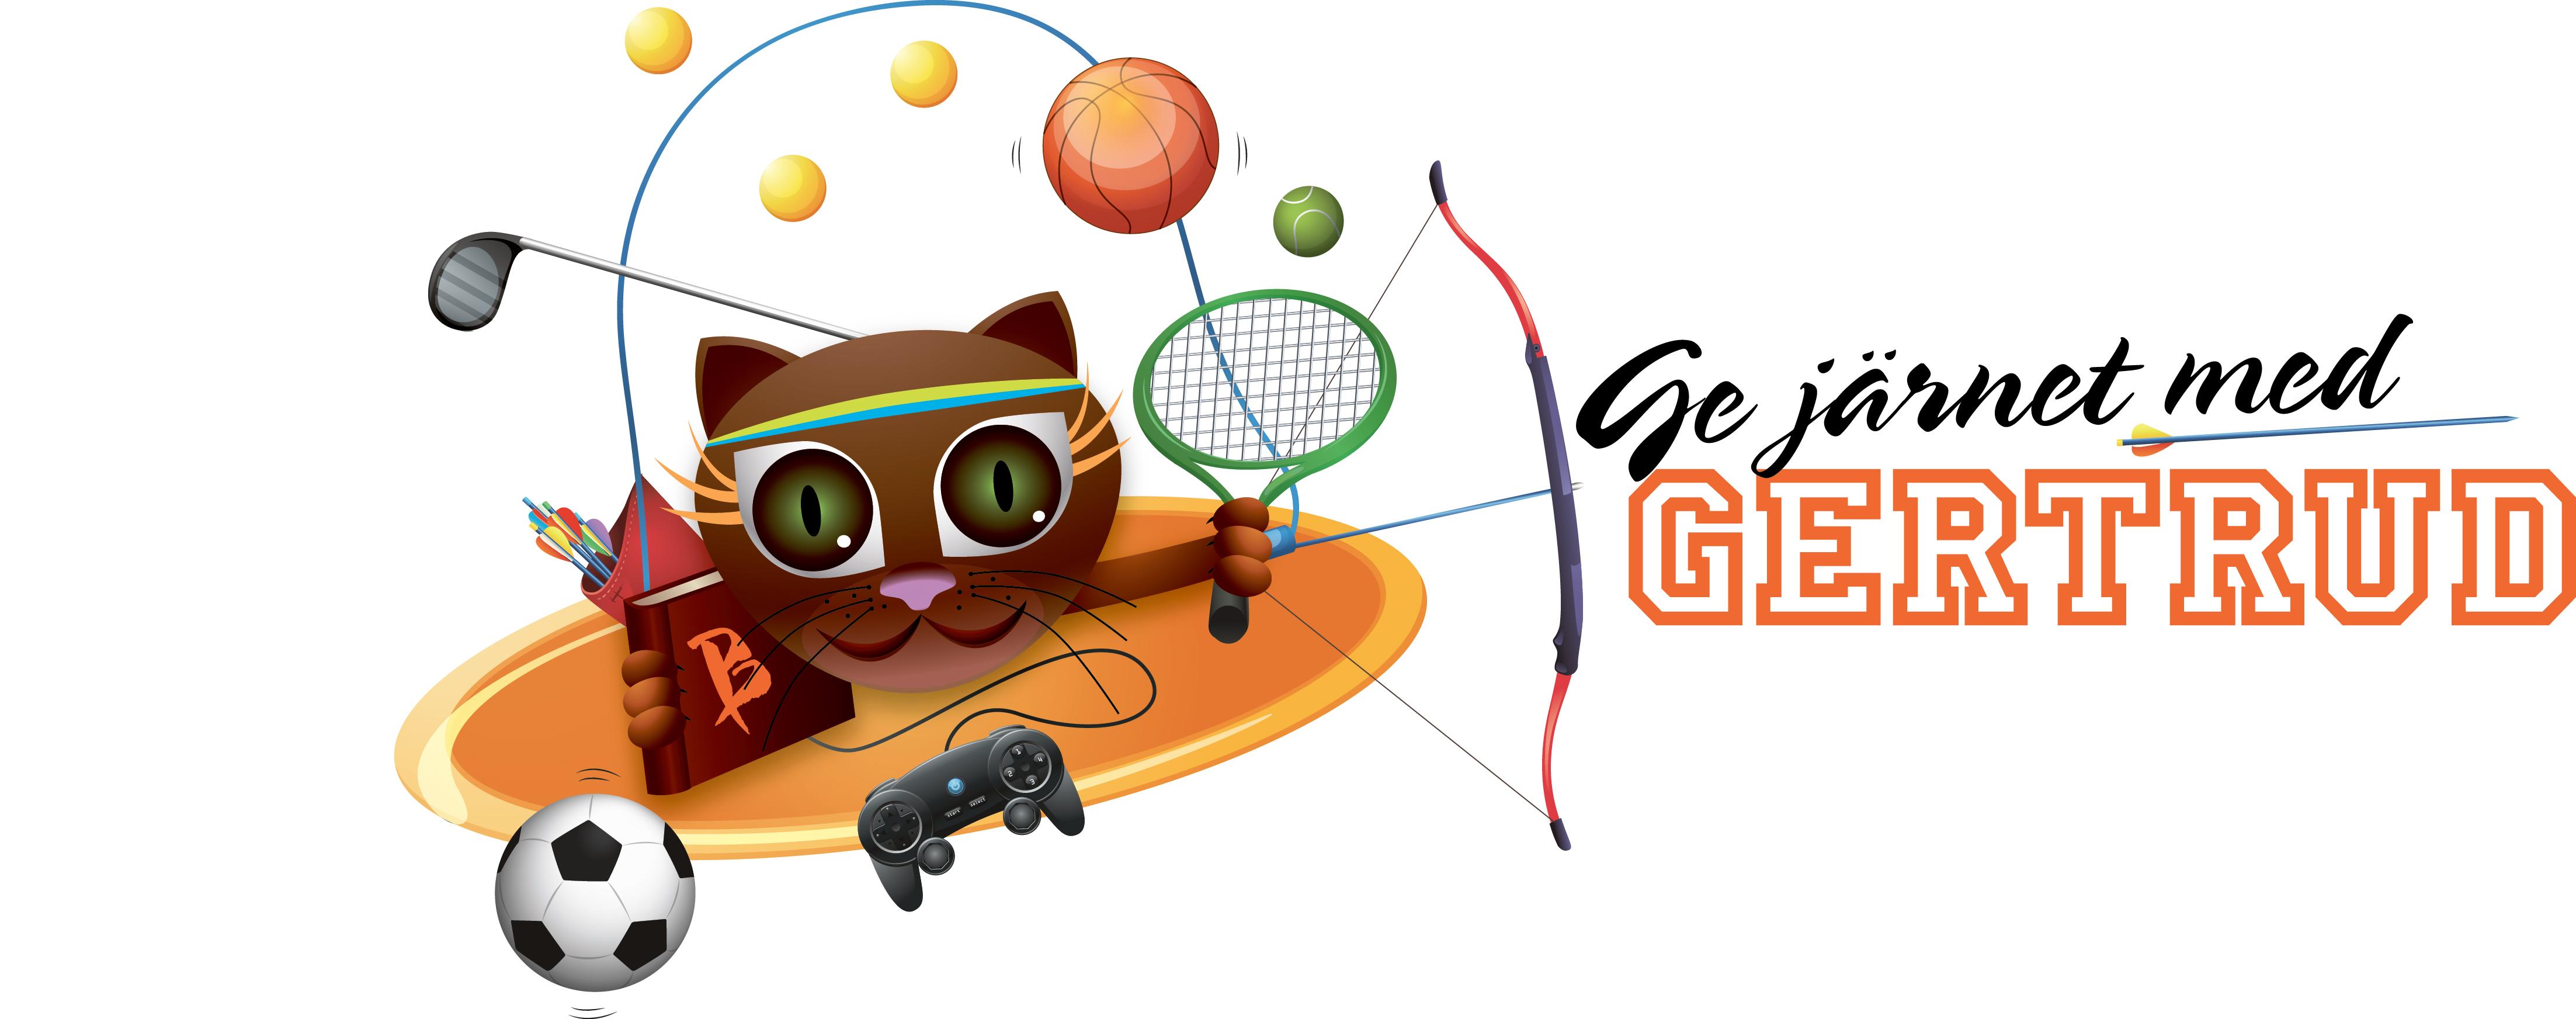 Sport-Gertrud